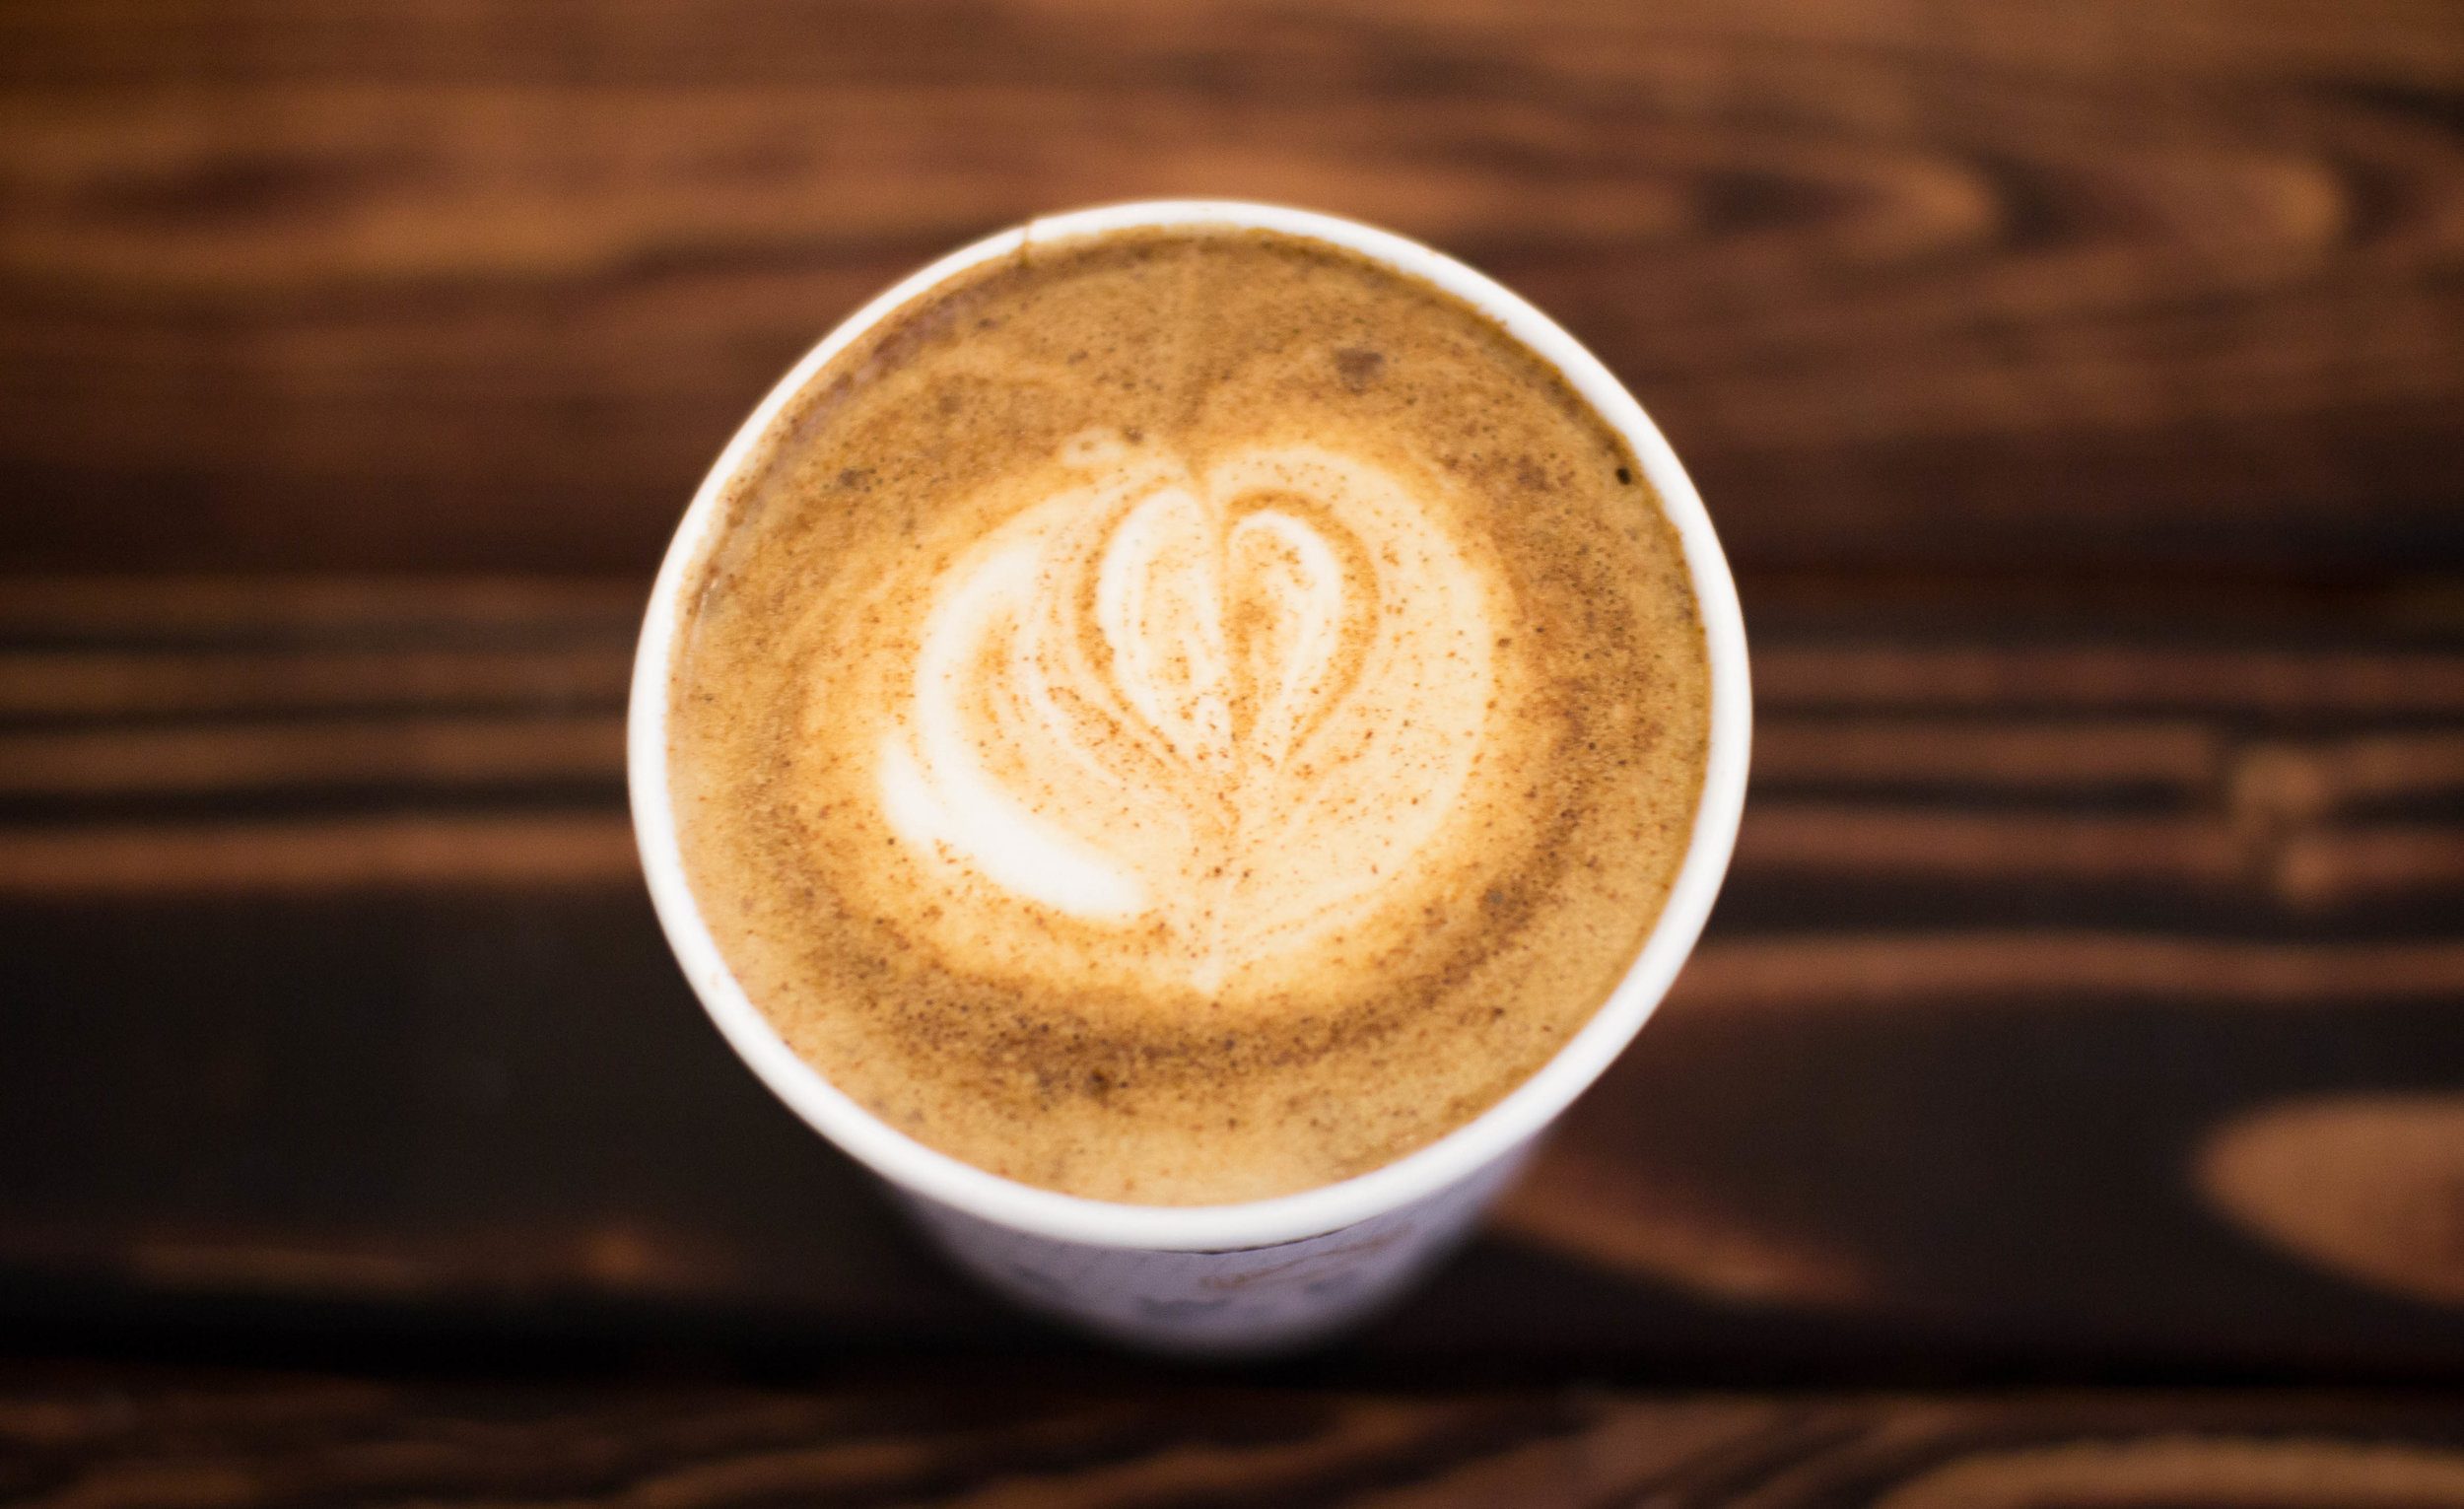 Coffee Shop in Elmhurst, Illinois